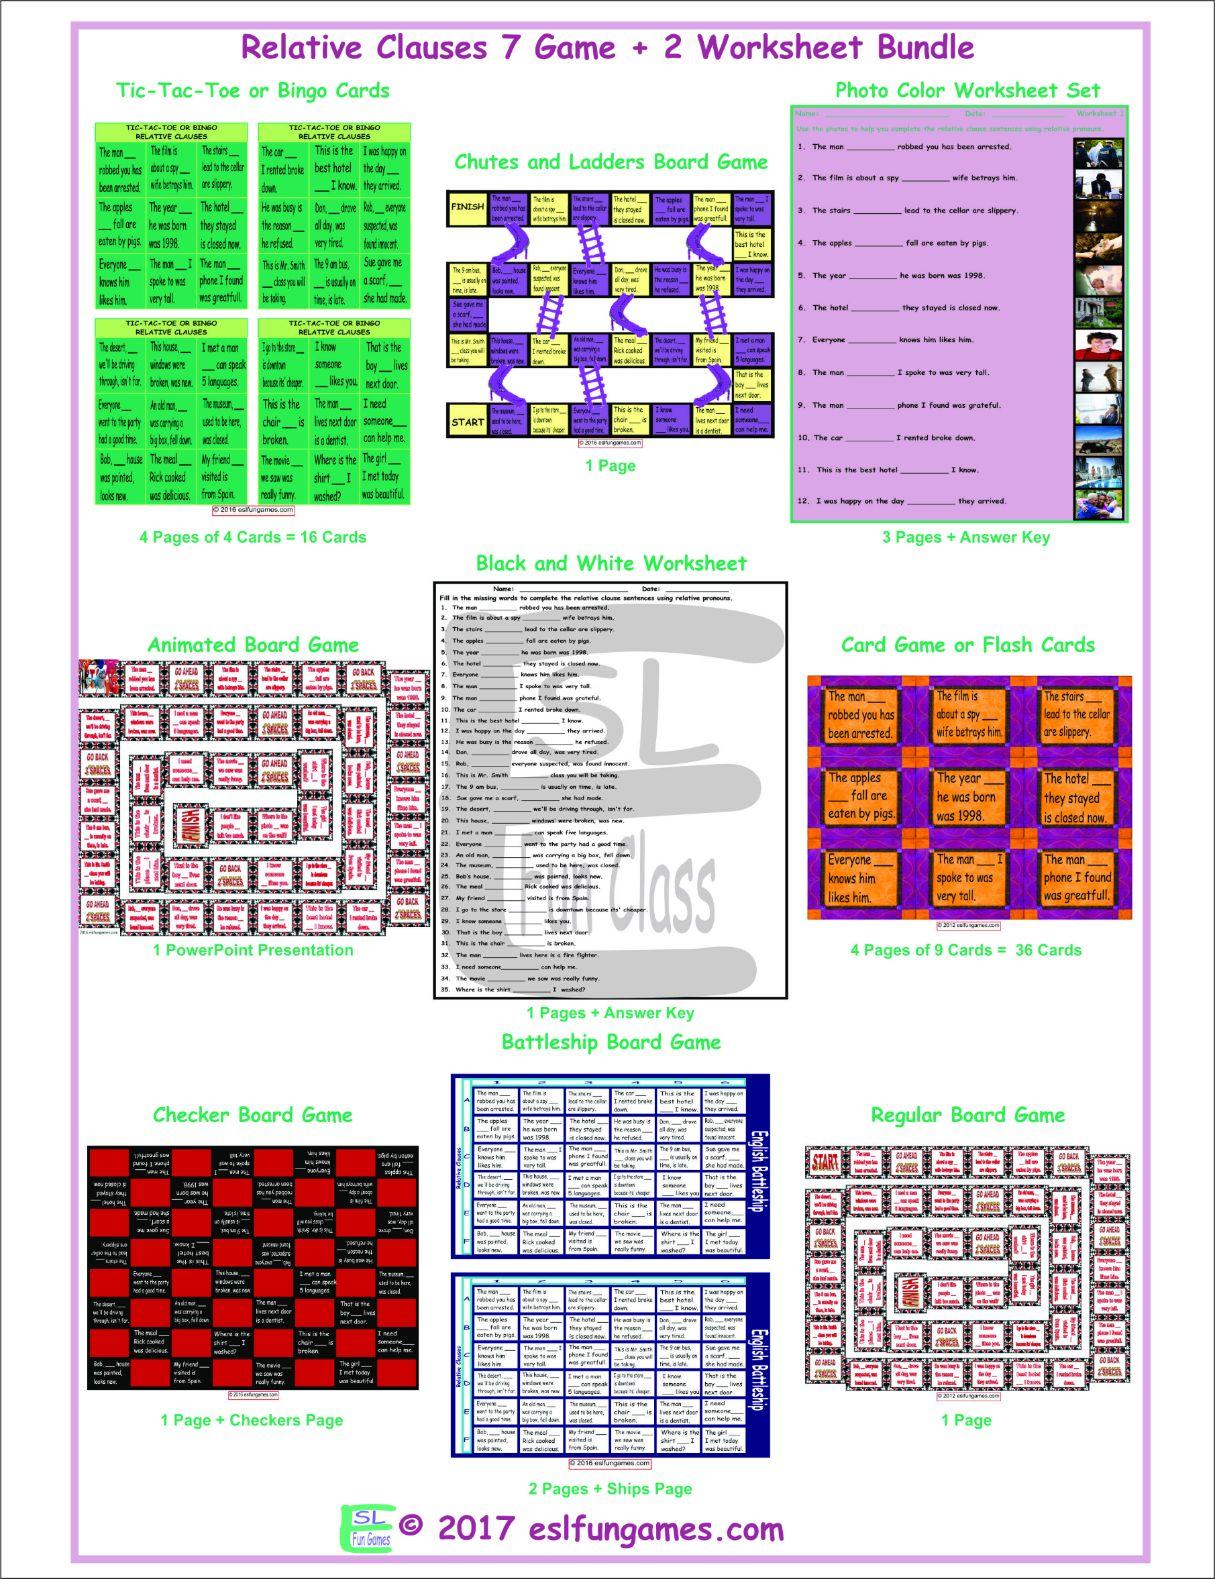 Relative Clauses 7 Game Plus 2 Worksheet Bundle